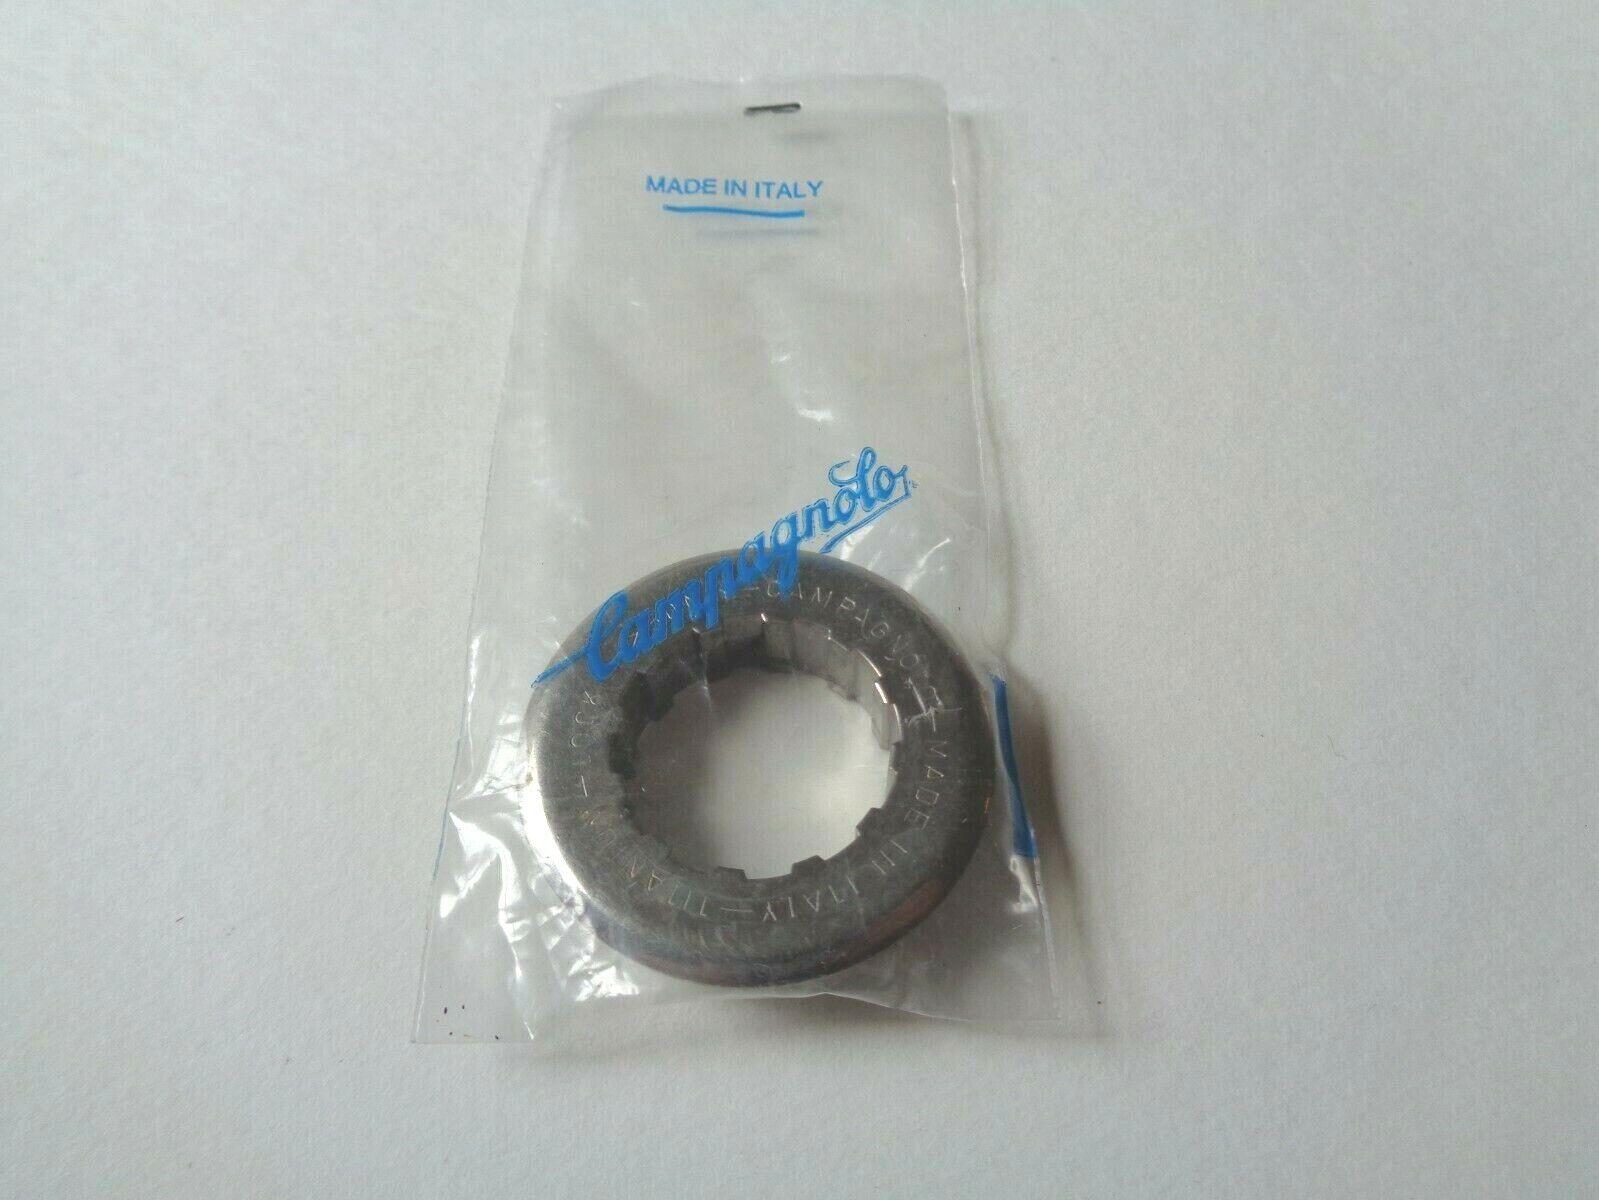 NOS Vintage 1990s Campagnolo Record Titanium cassette lock-ring